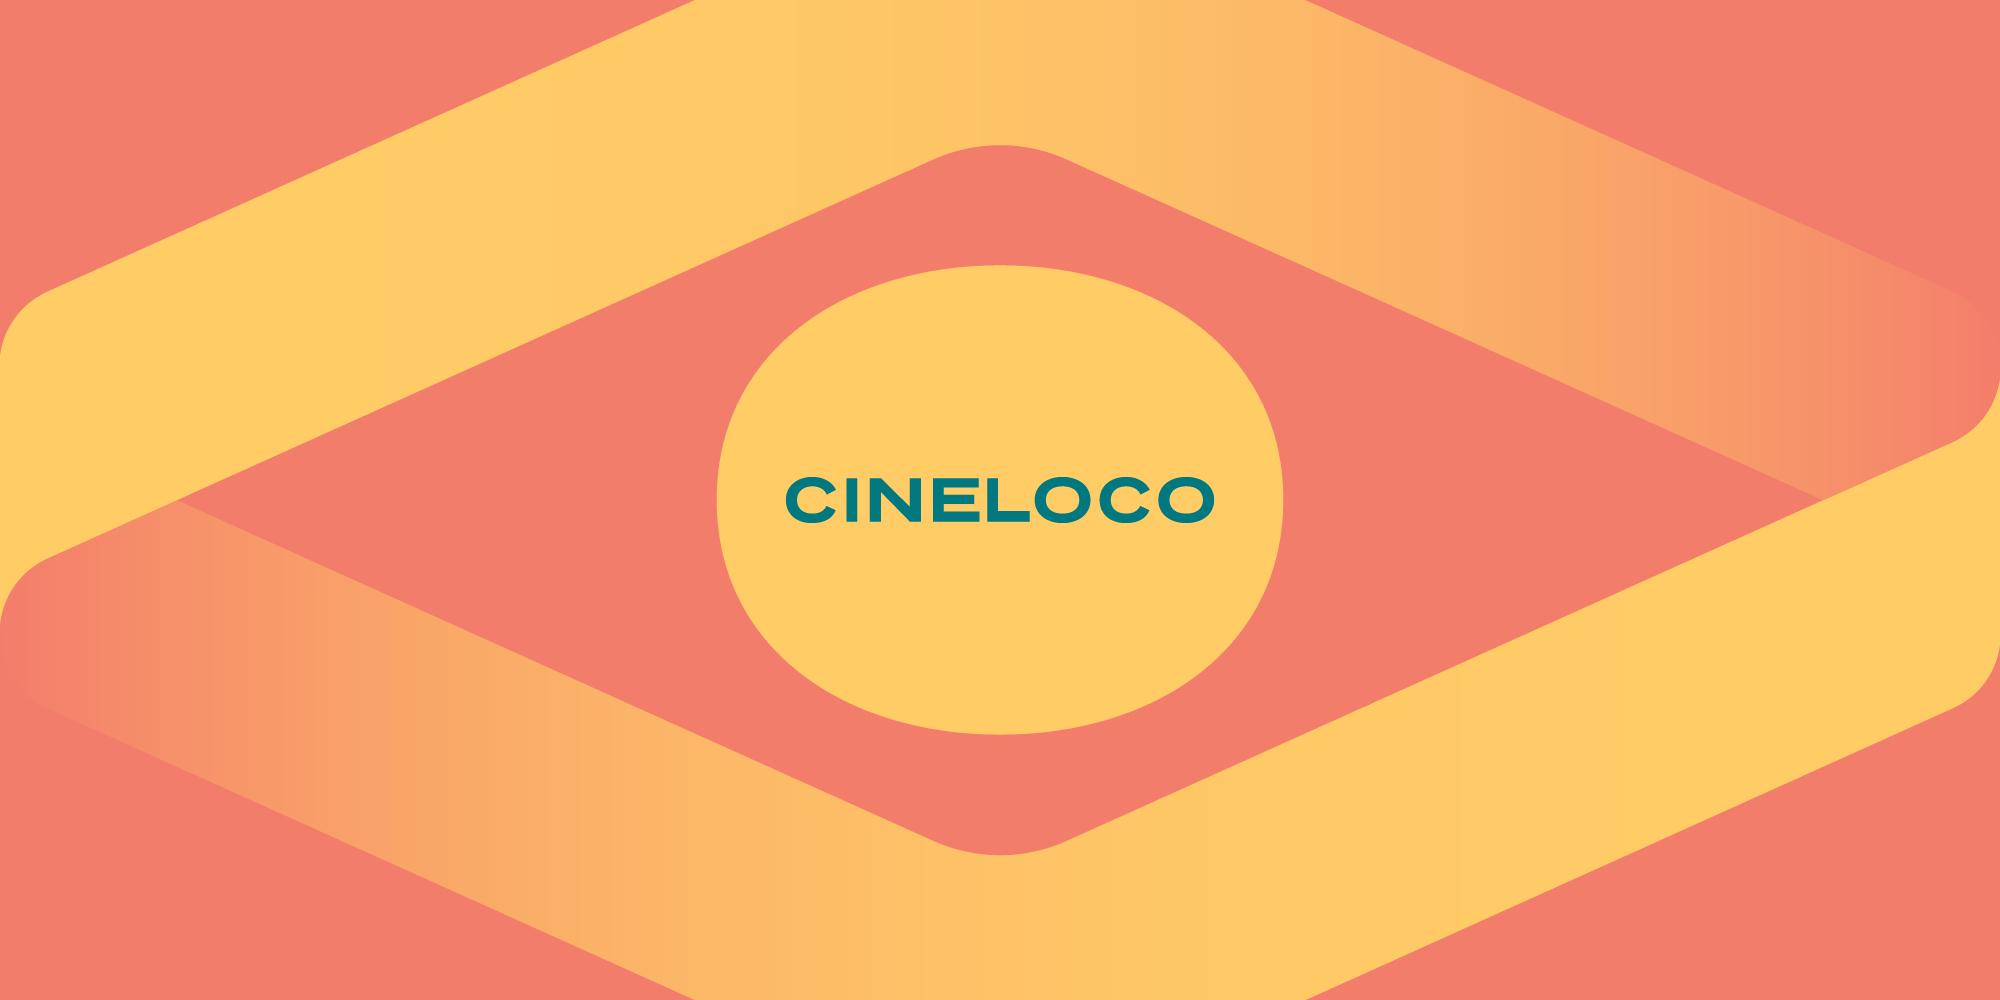 Cineloco_9.jpg